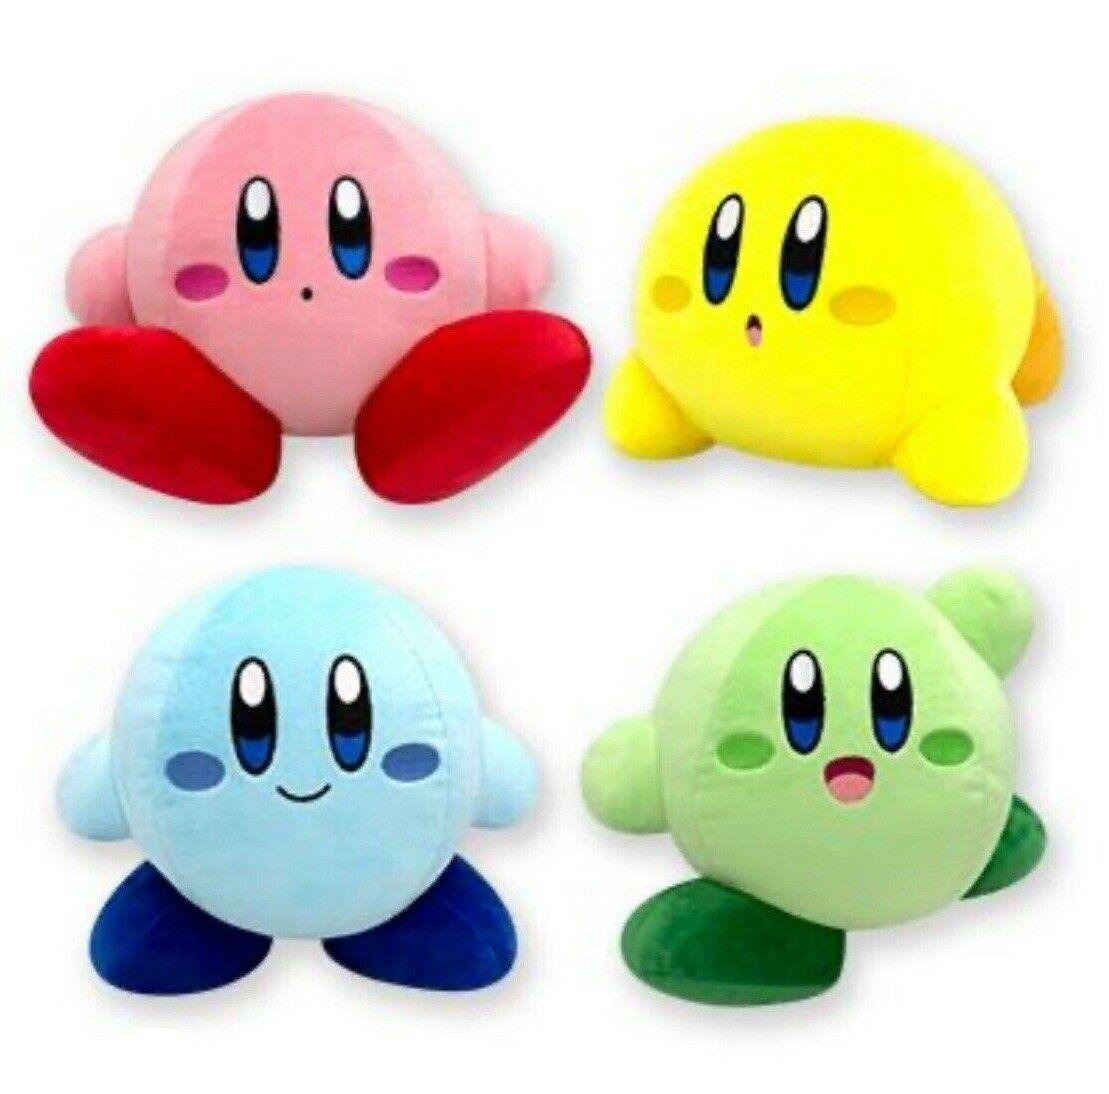 Hoshino Kirby Kirby's Dream Land Multi Farbe Plush Set of 4